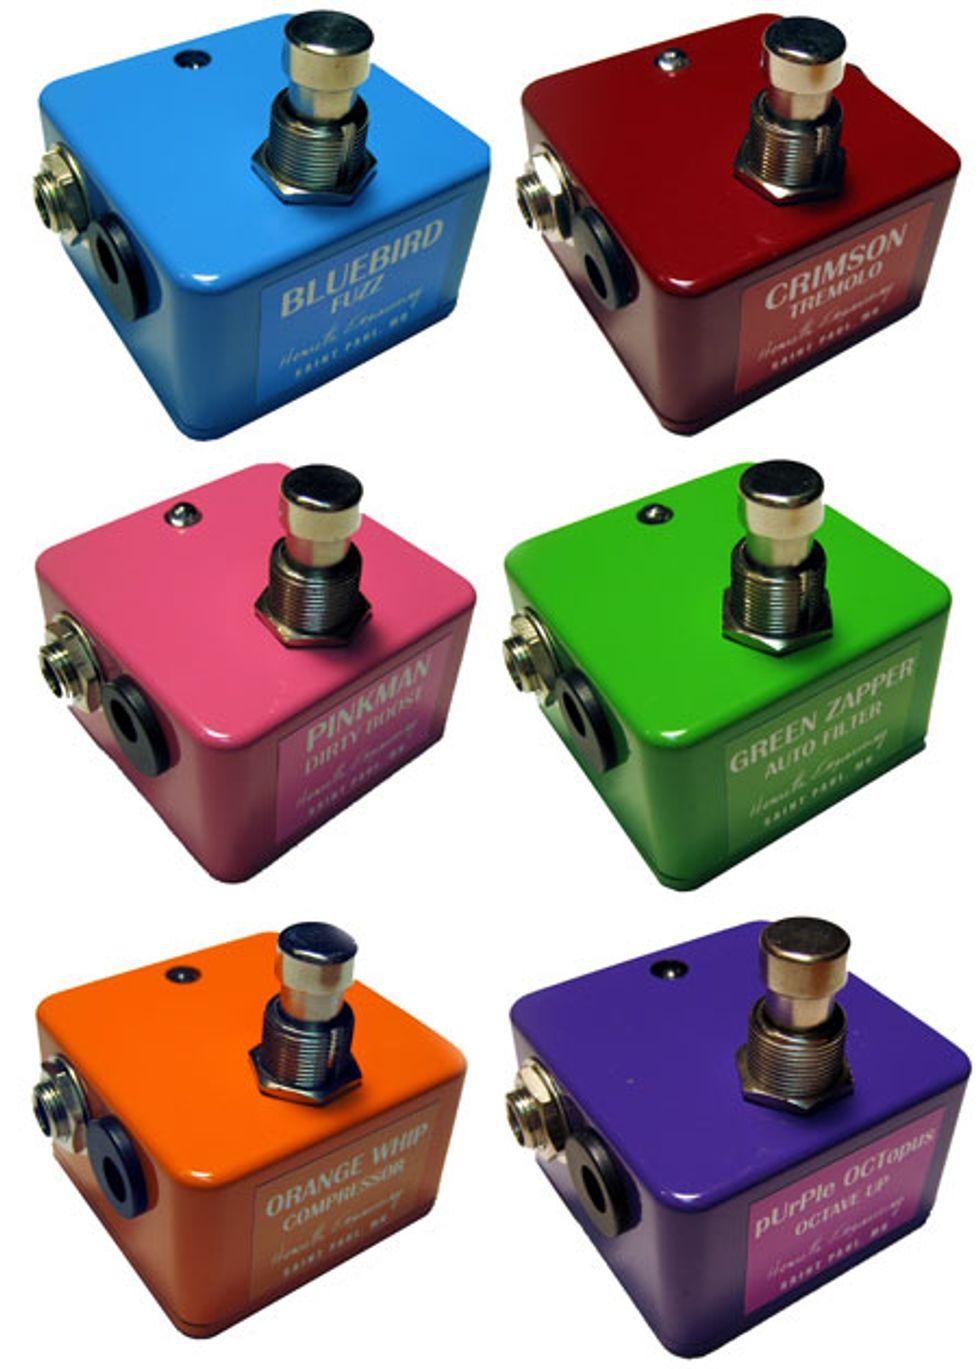 henretta engineering releases no knob line of pedals 2013 11 18 premier guitar. Black Bedroom Furniture Sets. Home Design Ideas